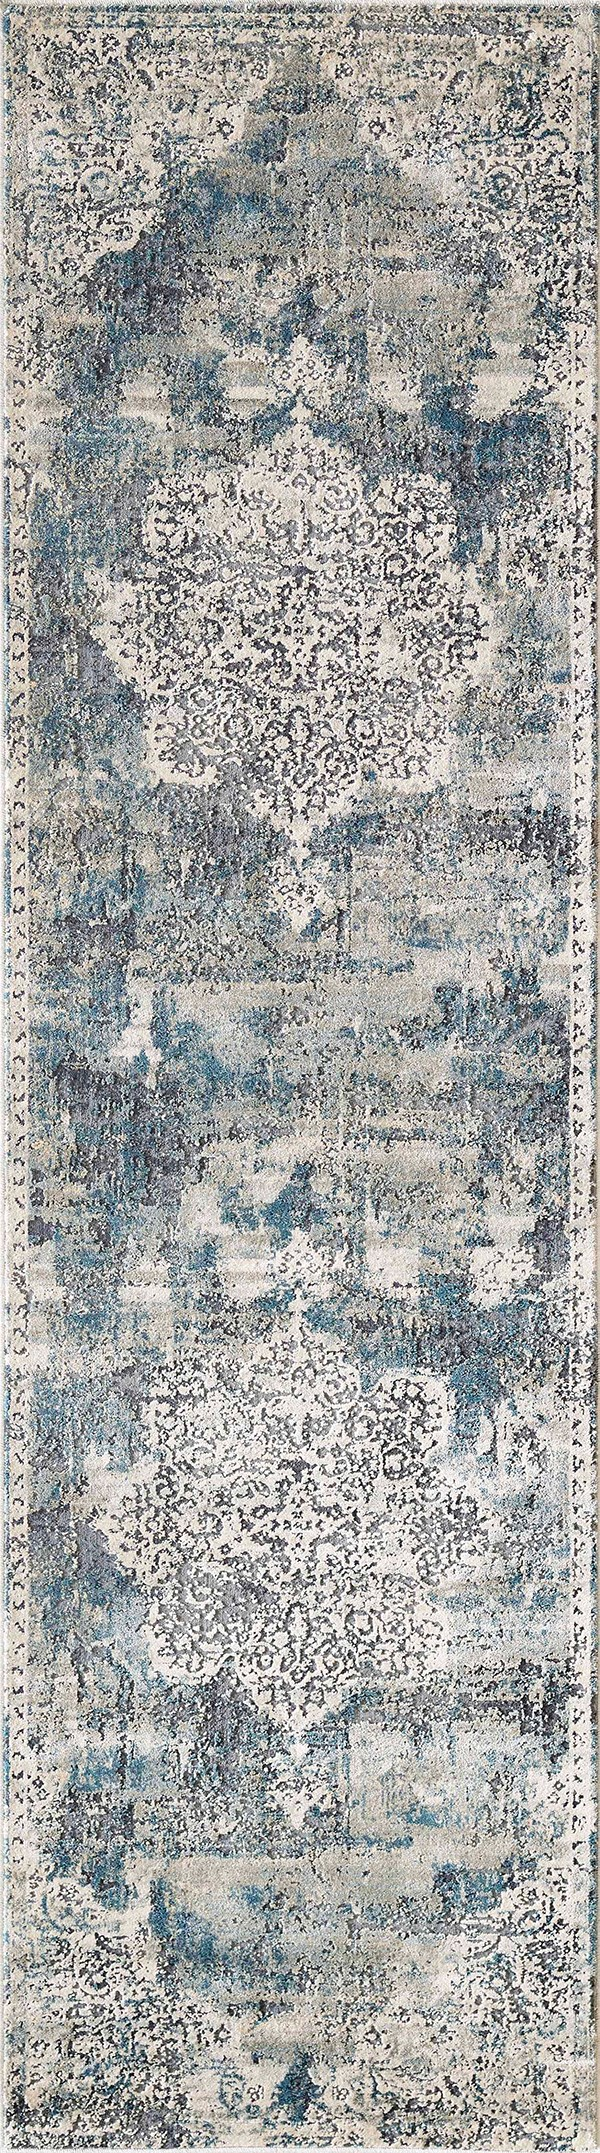 Ivory, Teal (4765) Vintage / Overdyed Area Rug